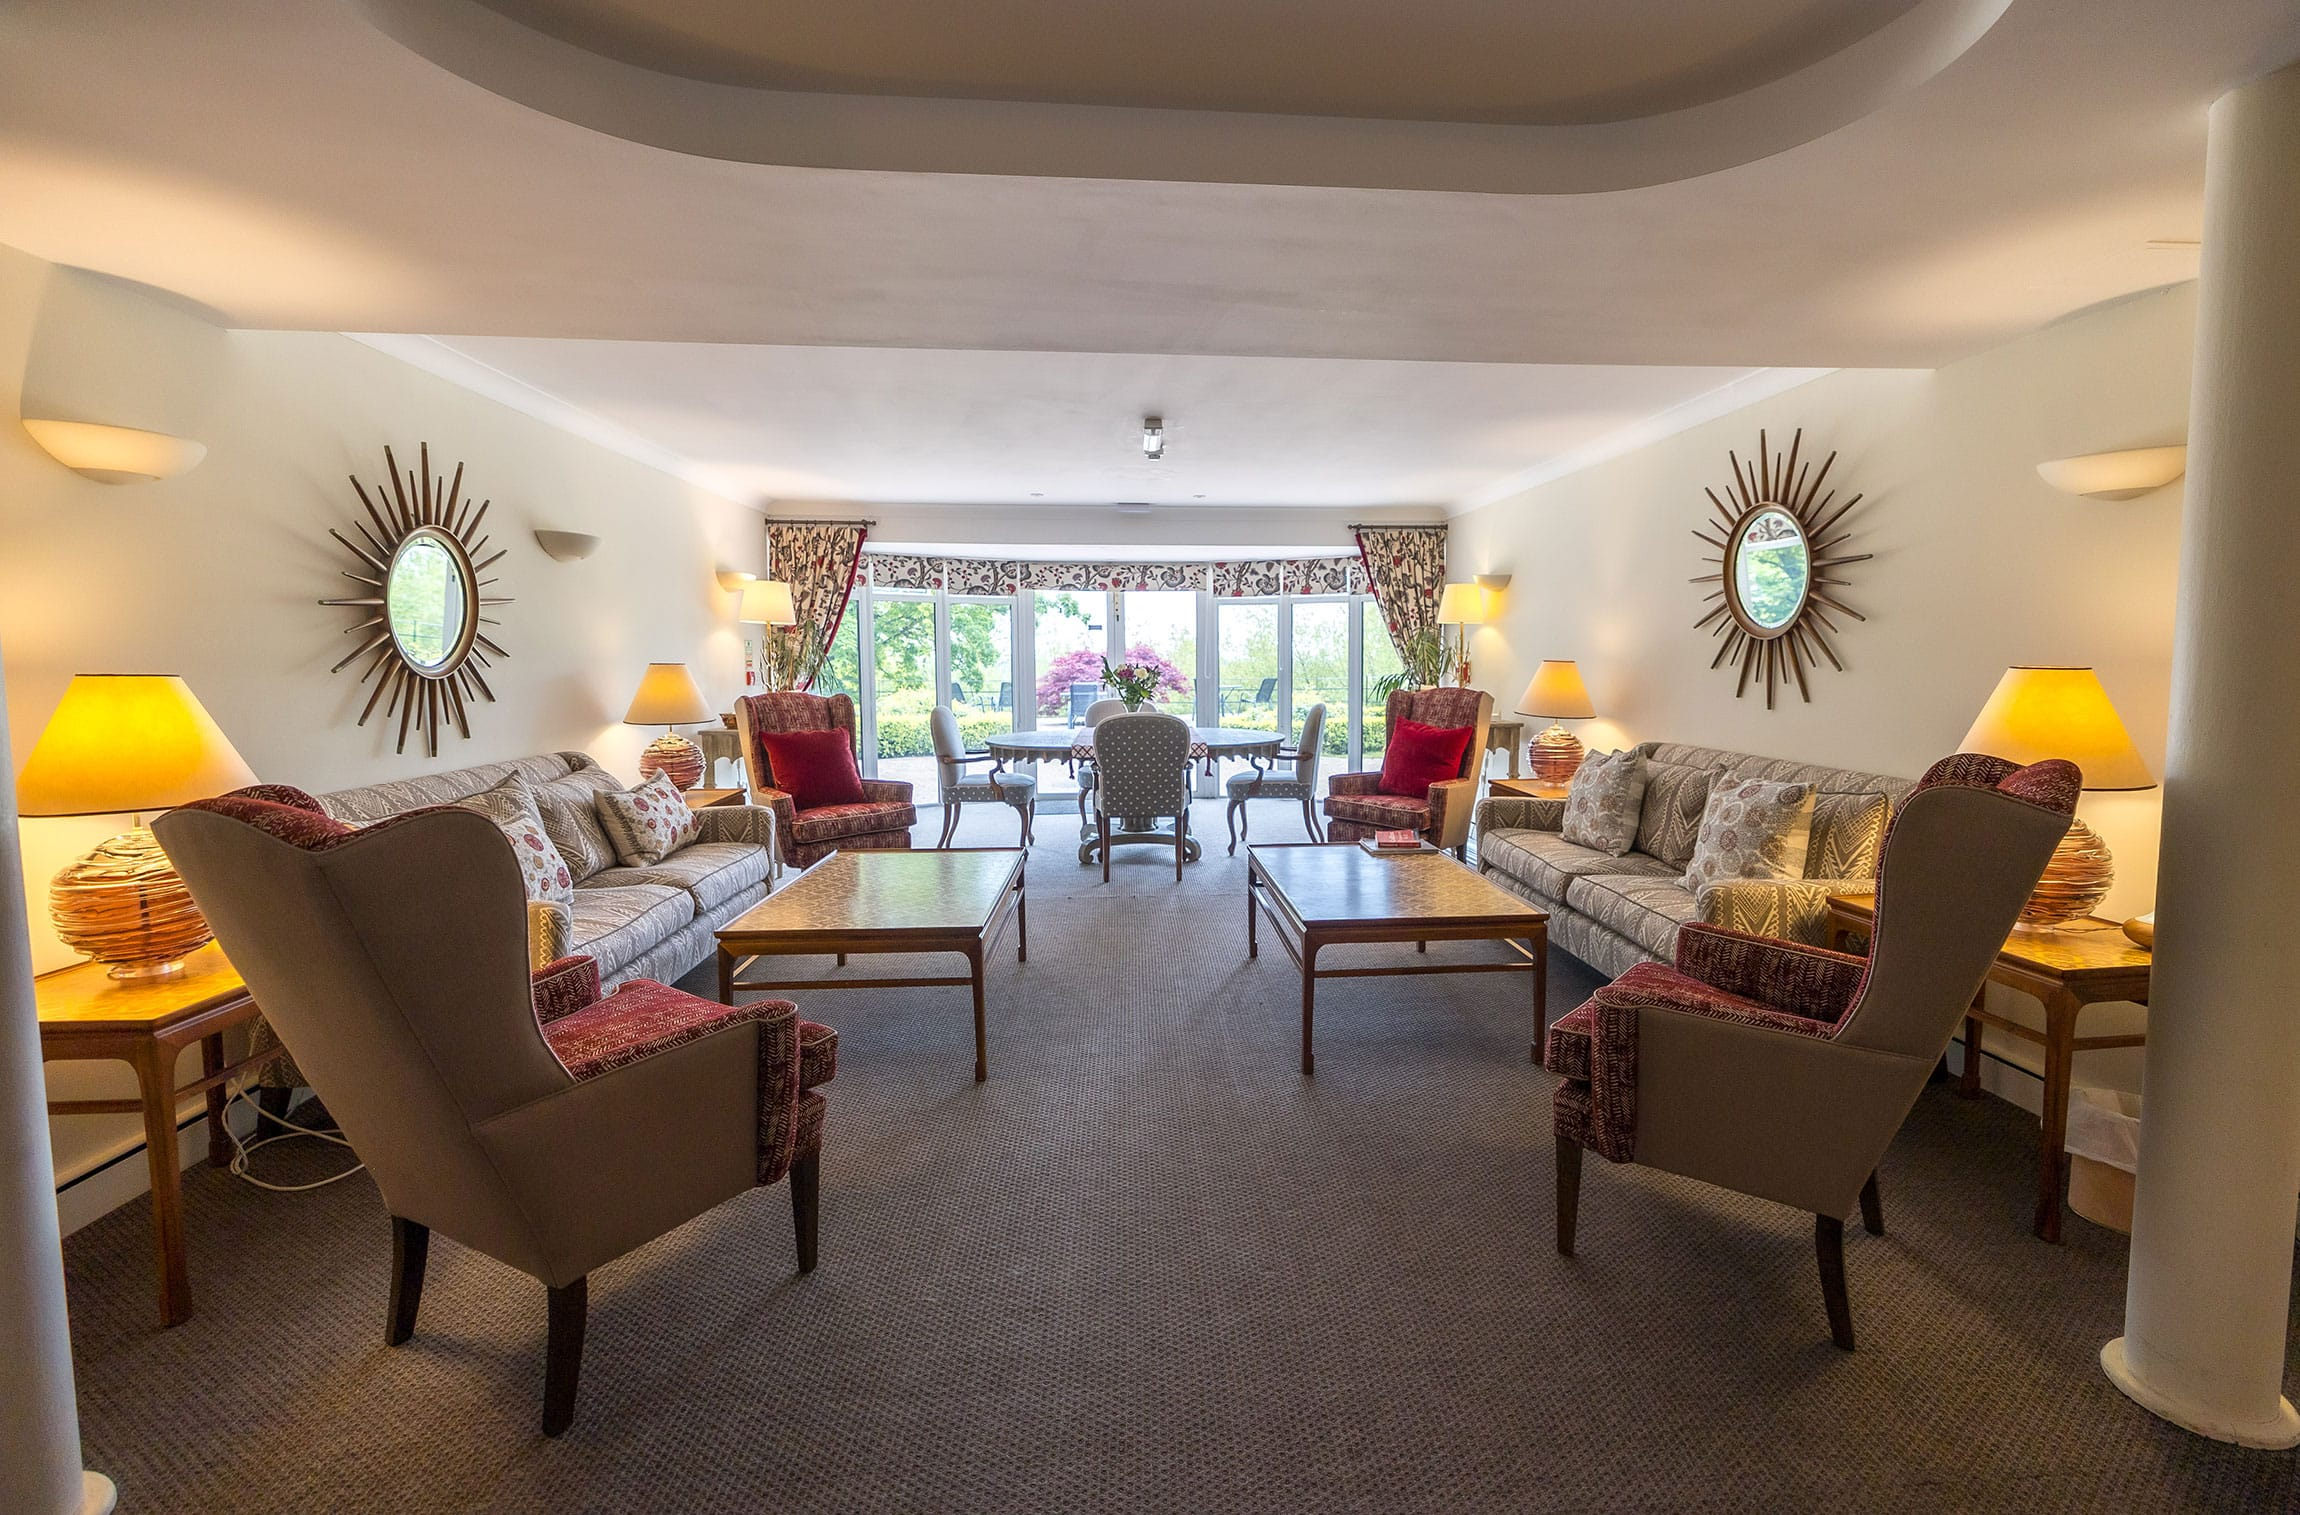 Lower Ground Floor designed by William Yeoward Interiors